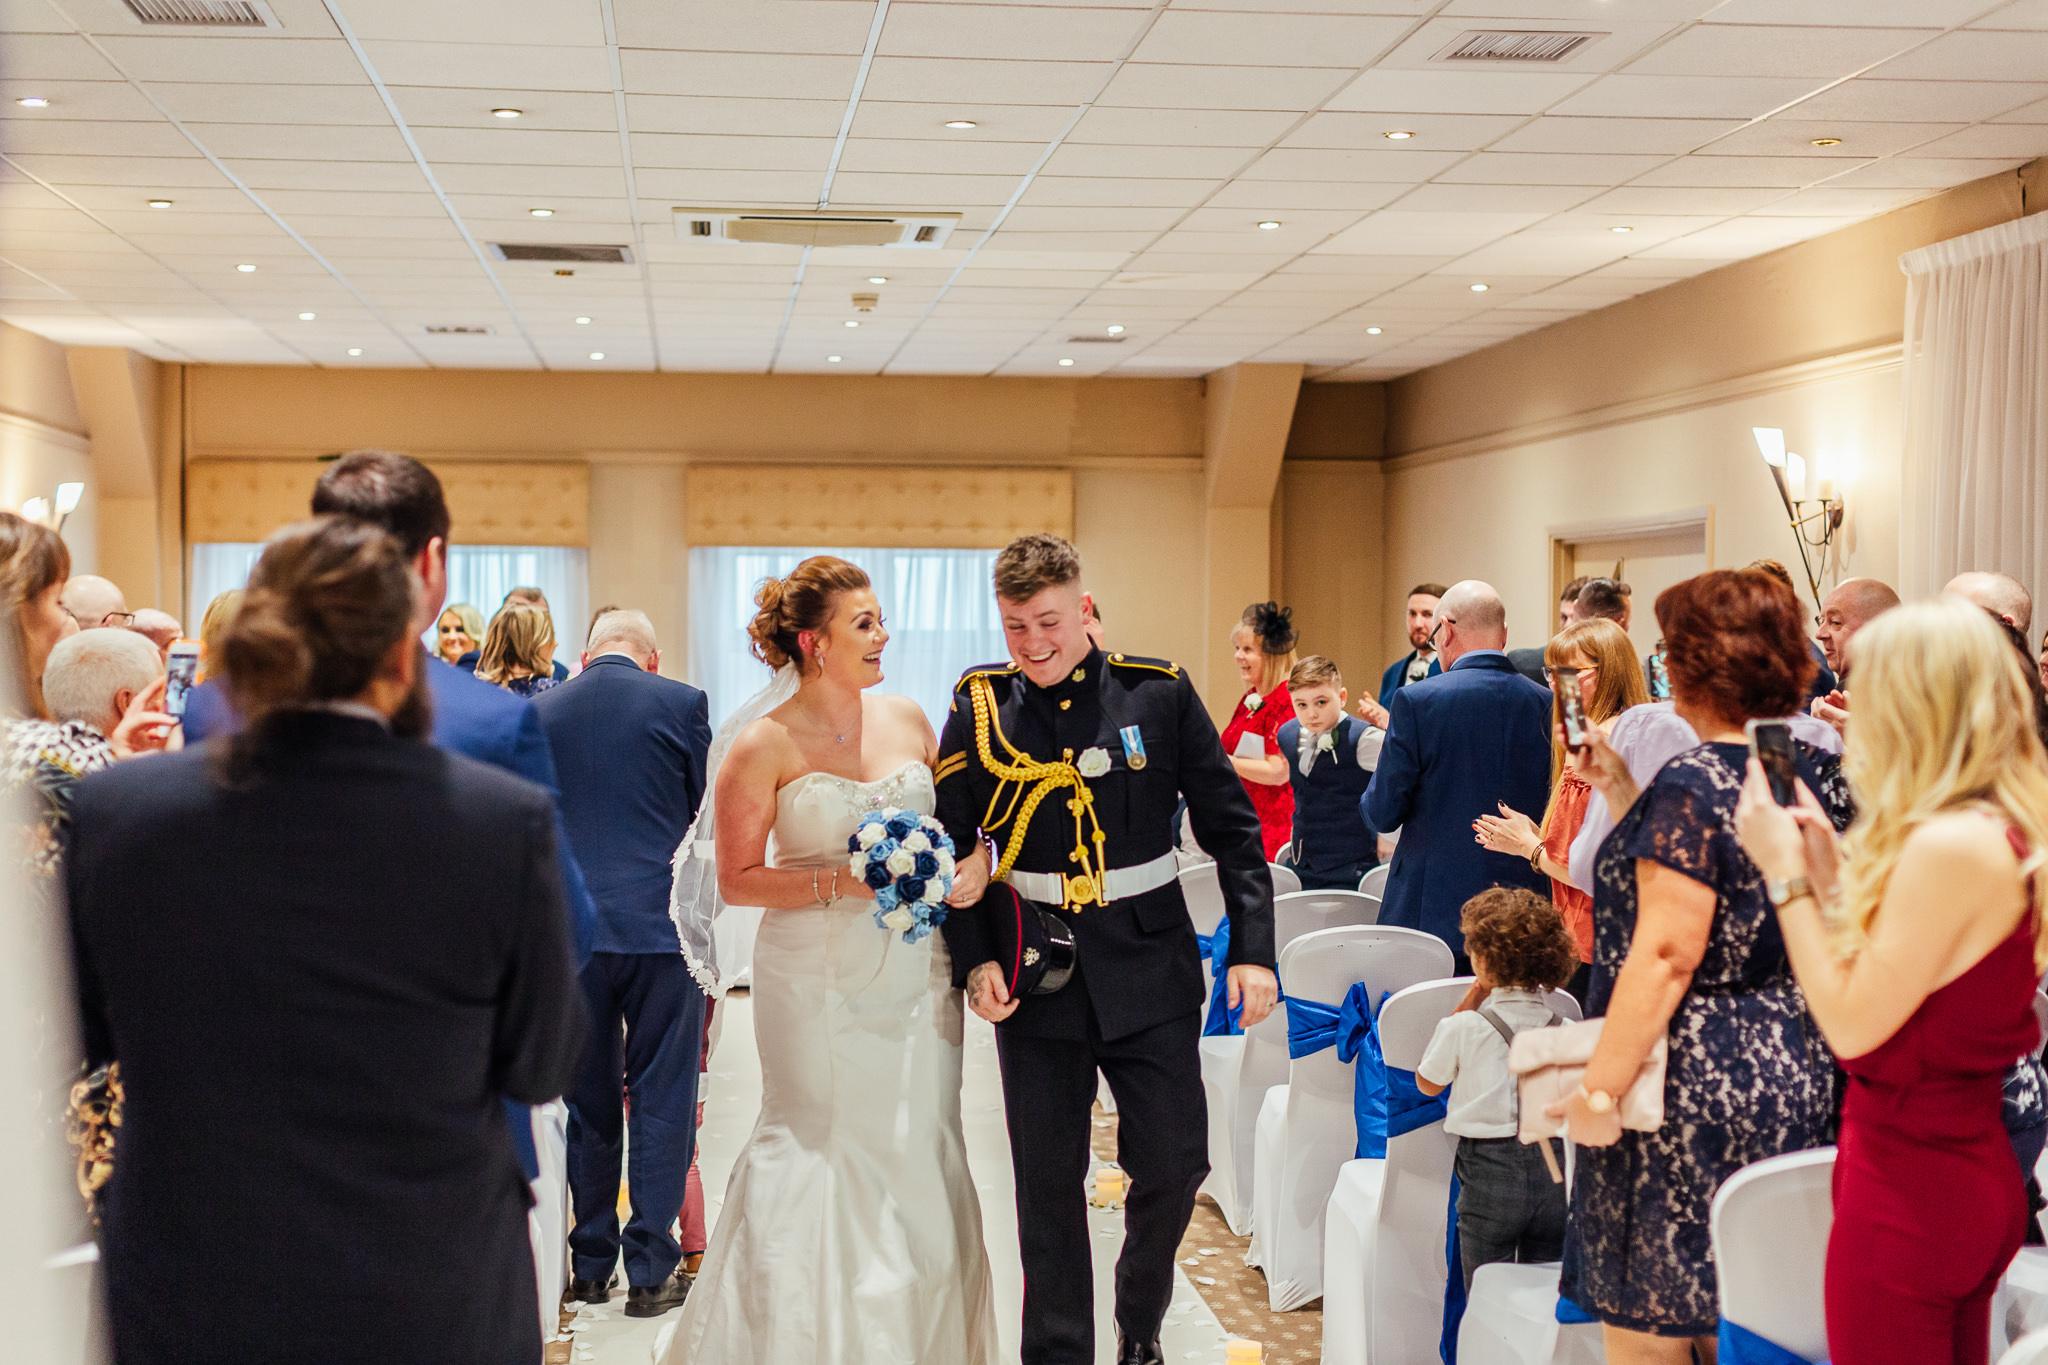 Mollingtonbanastre_wedding-13.jpg